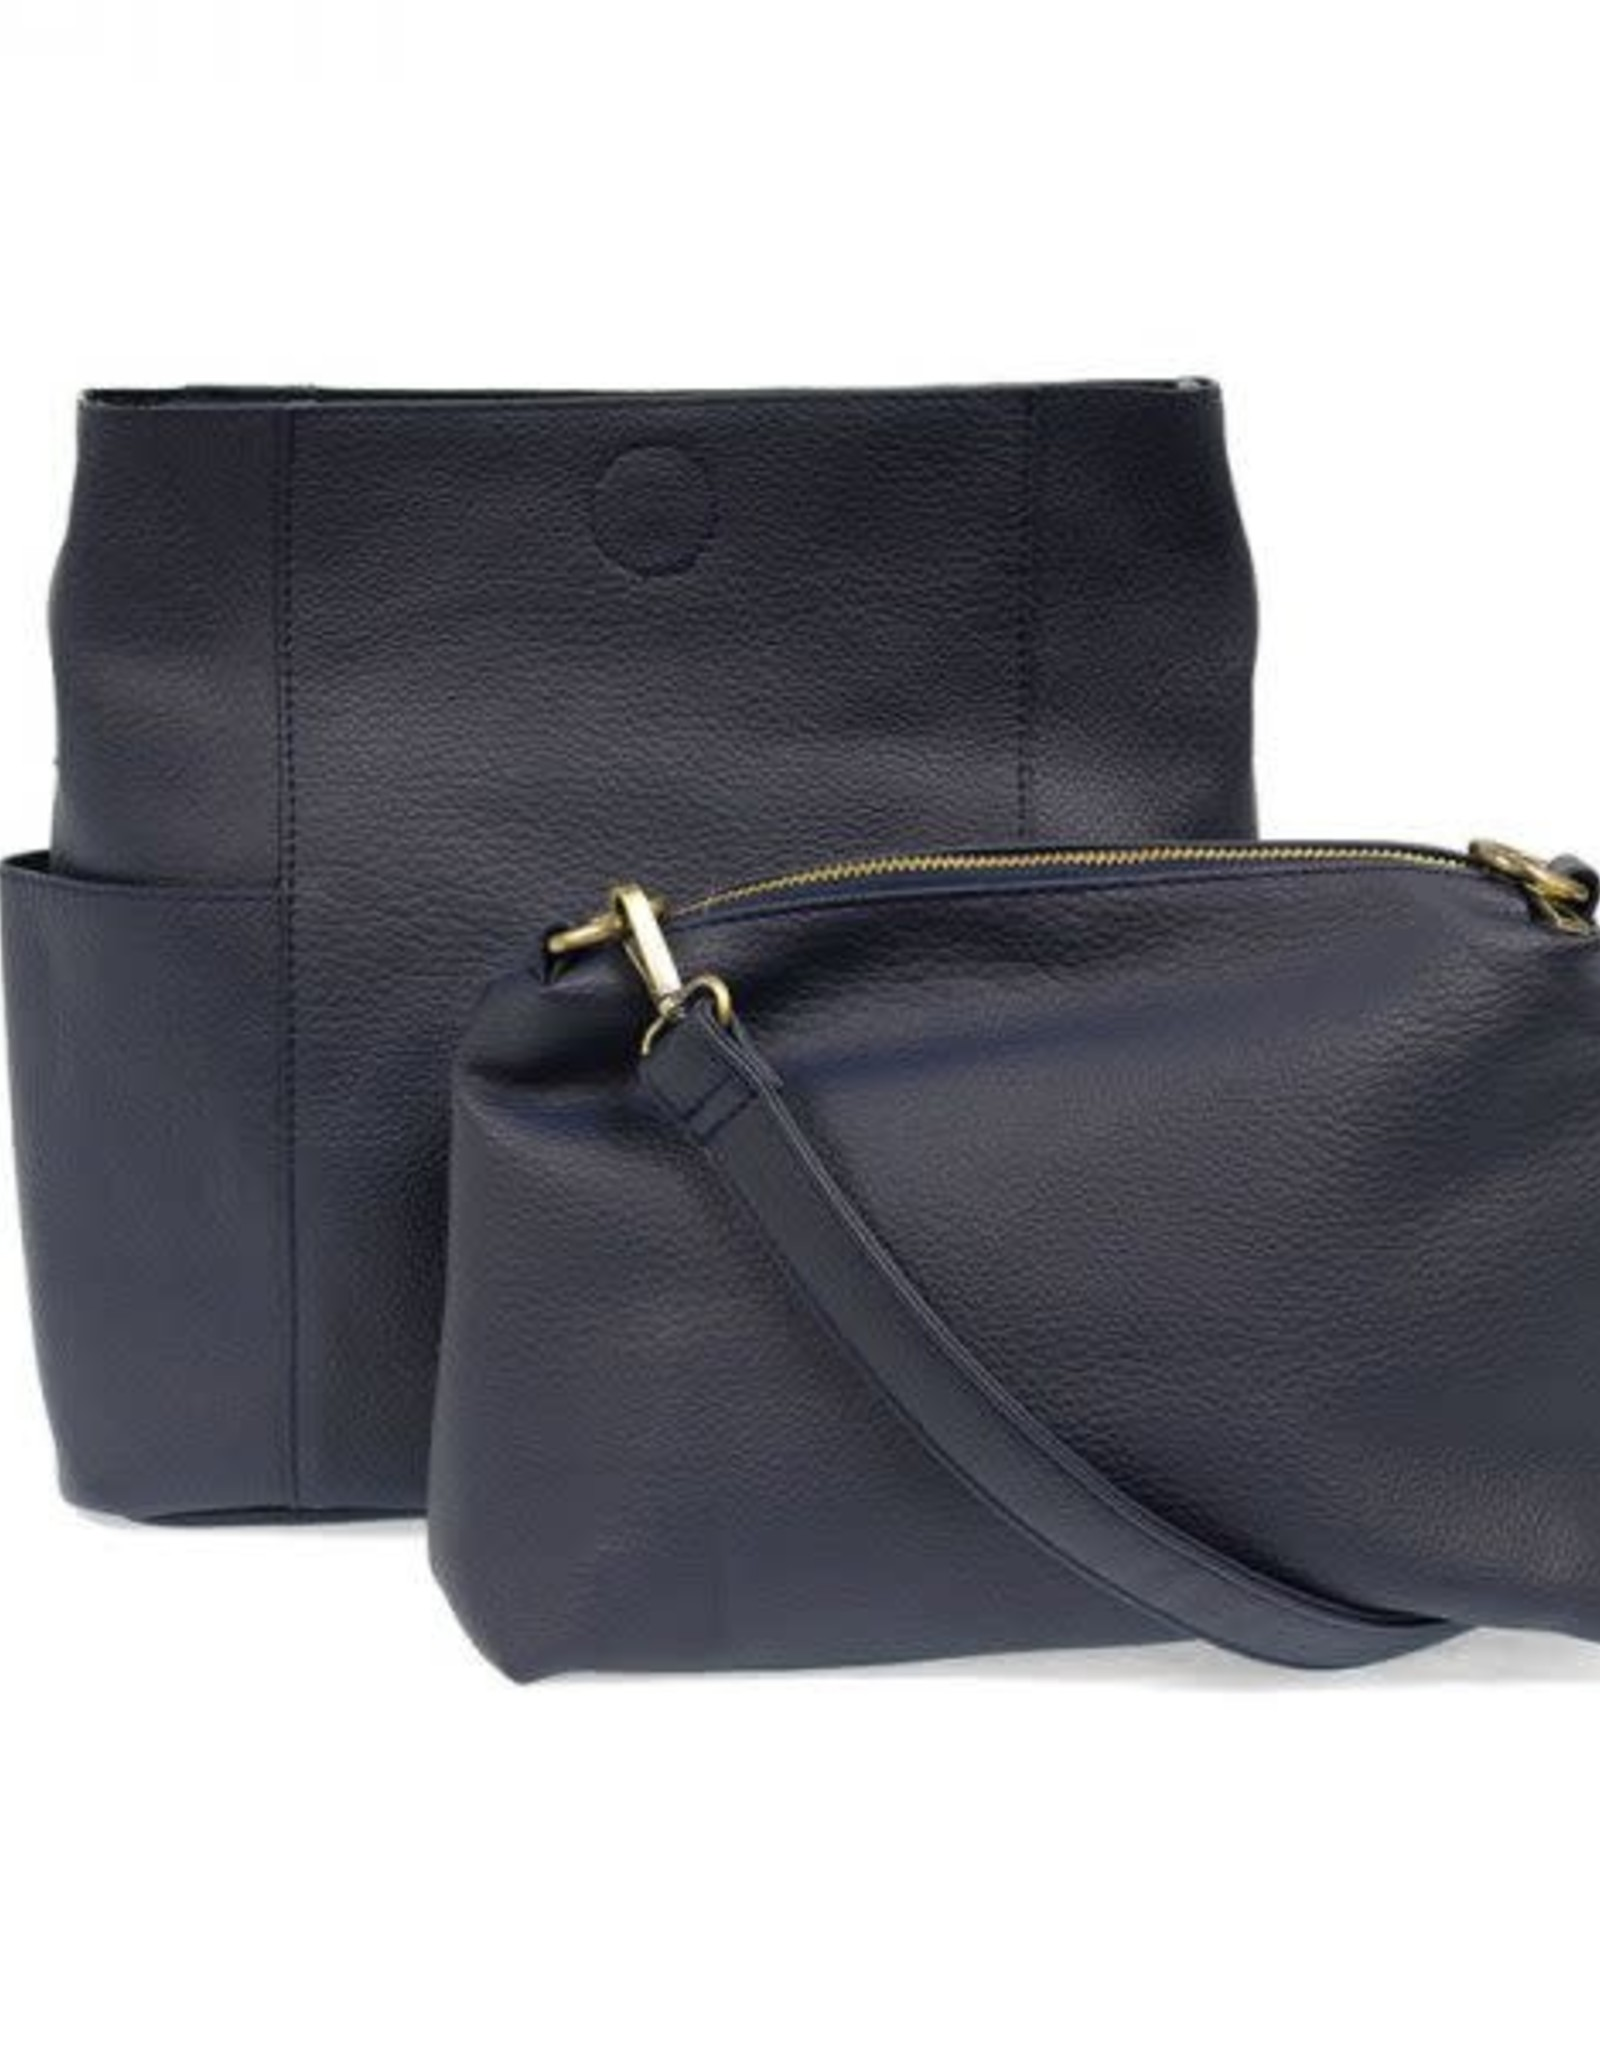 Navy Kayleigh Side Pocket Bucket Bag Set of 2